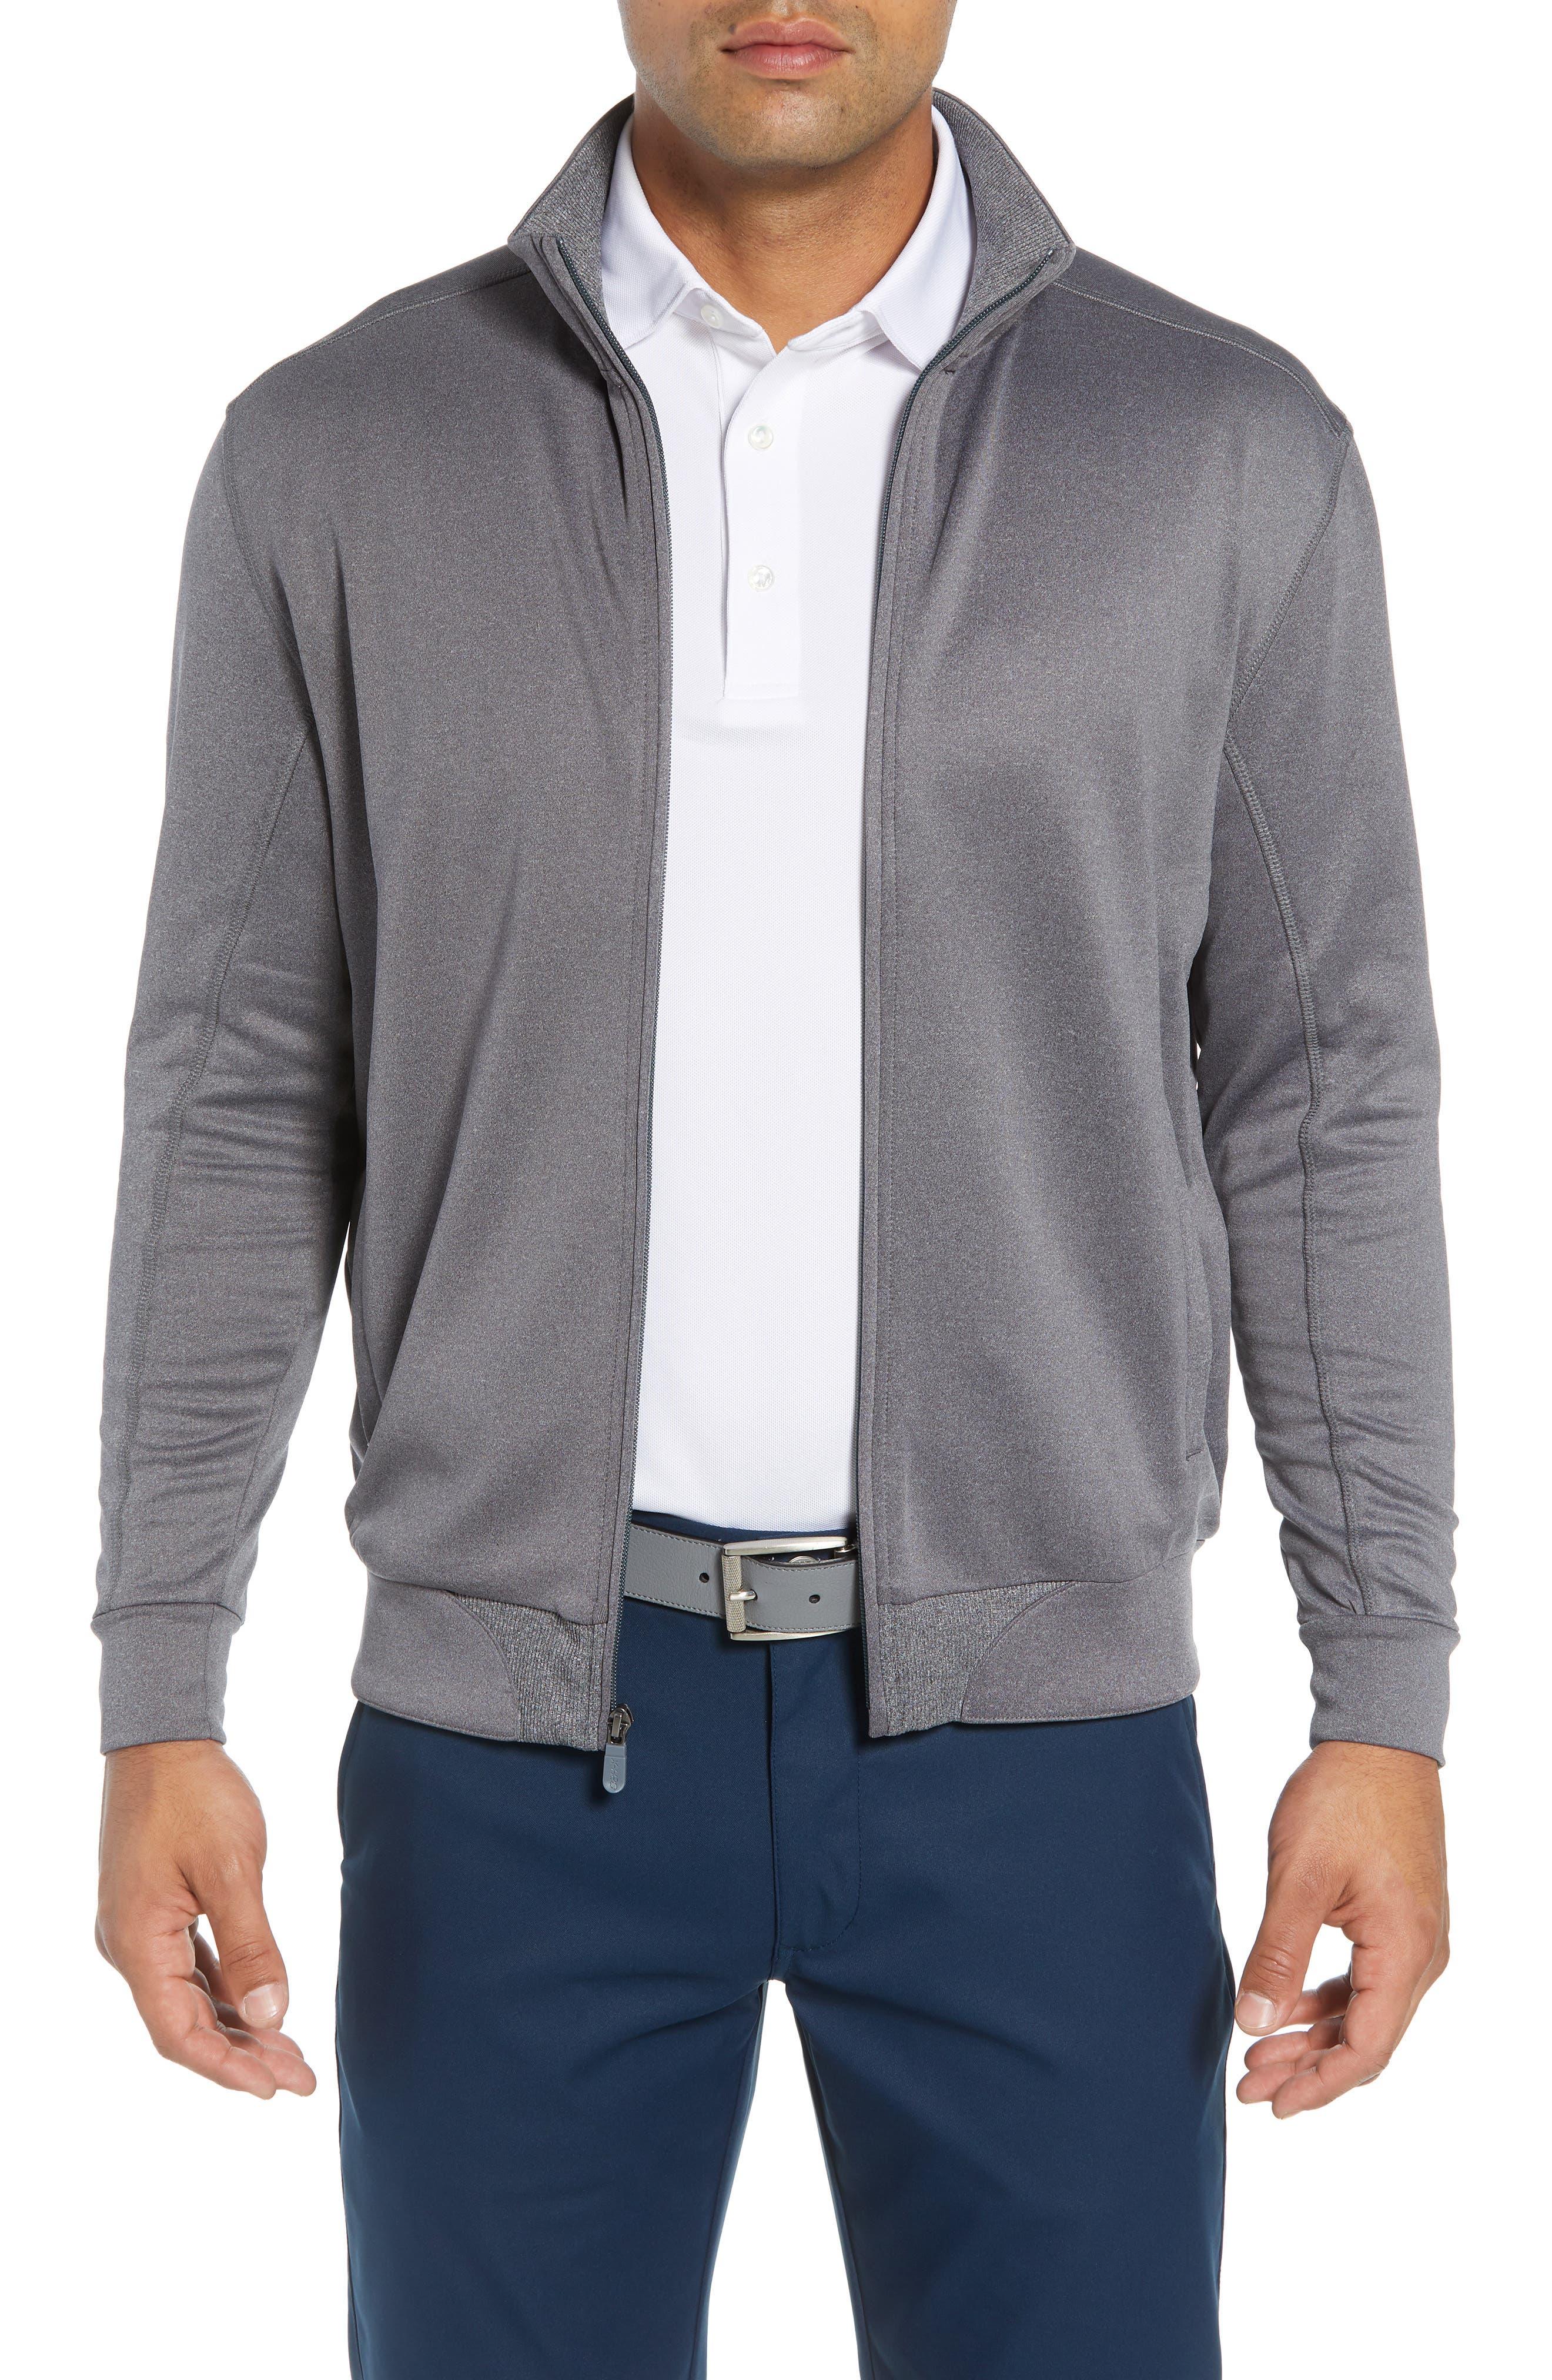 XH20 Denali Performance Jacket,                             Main thumbnail 1, color,                             GRAPHITE